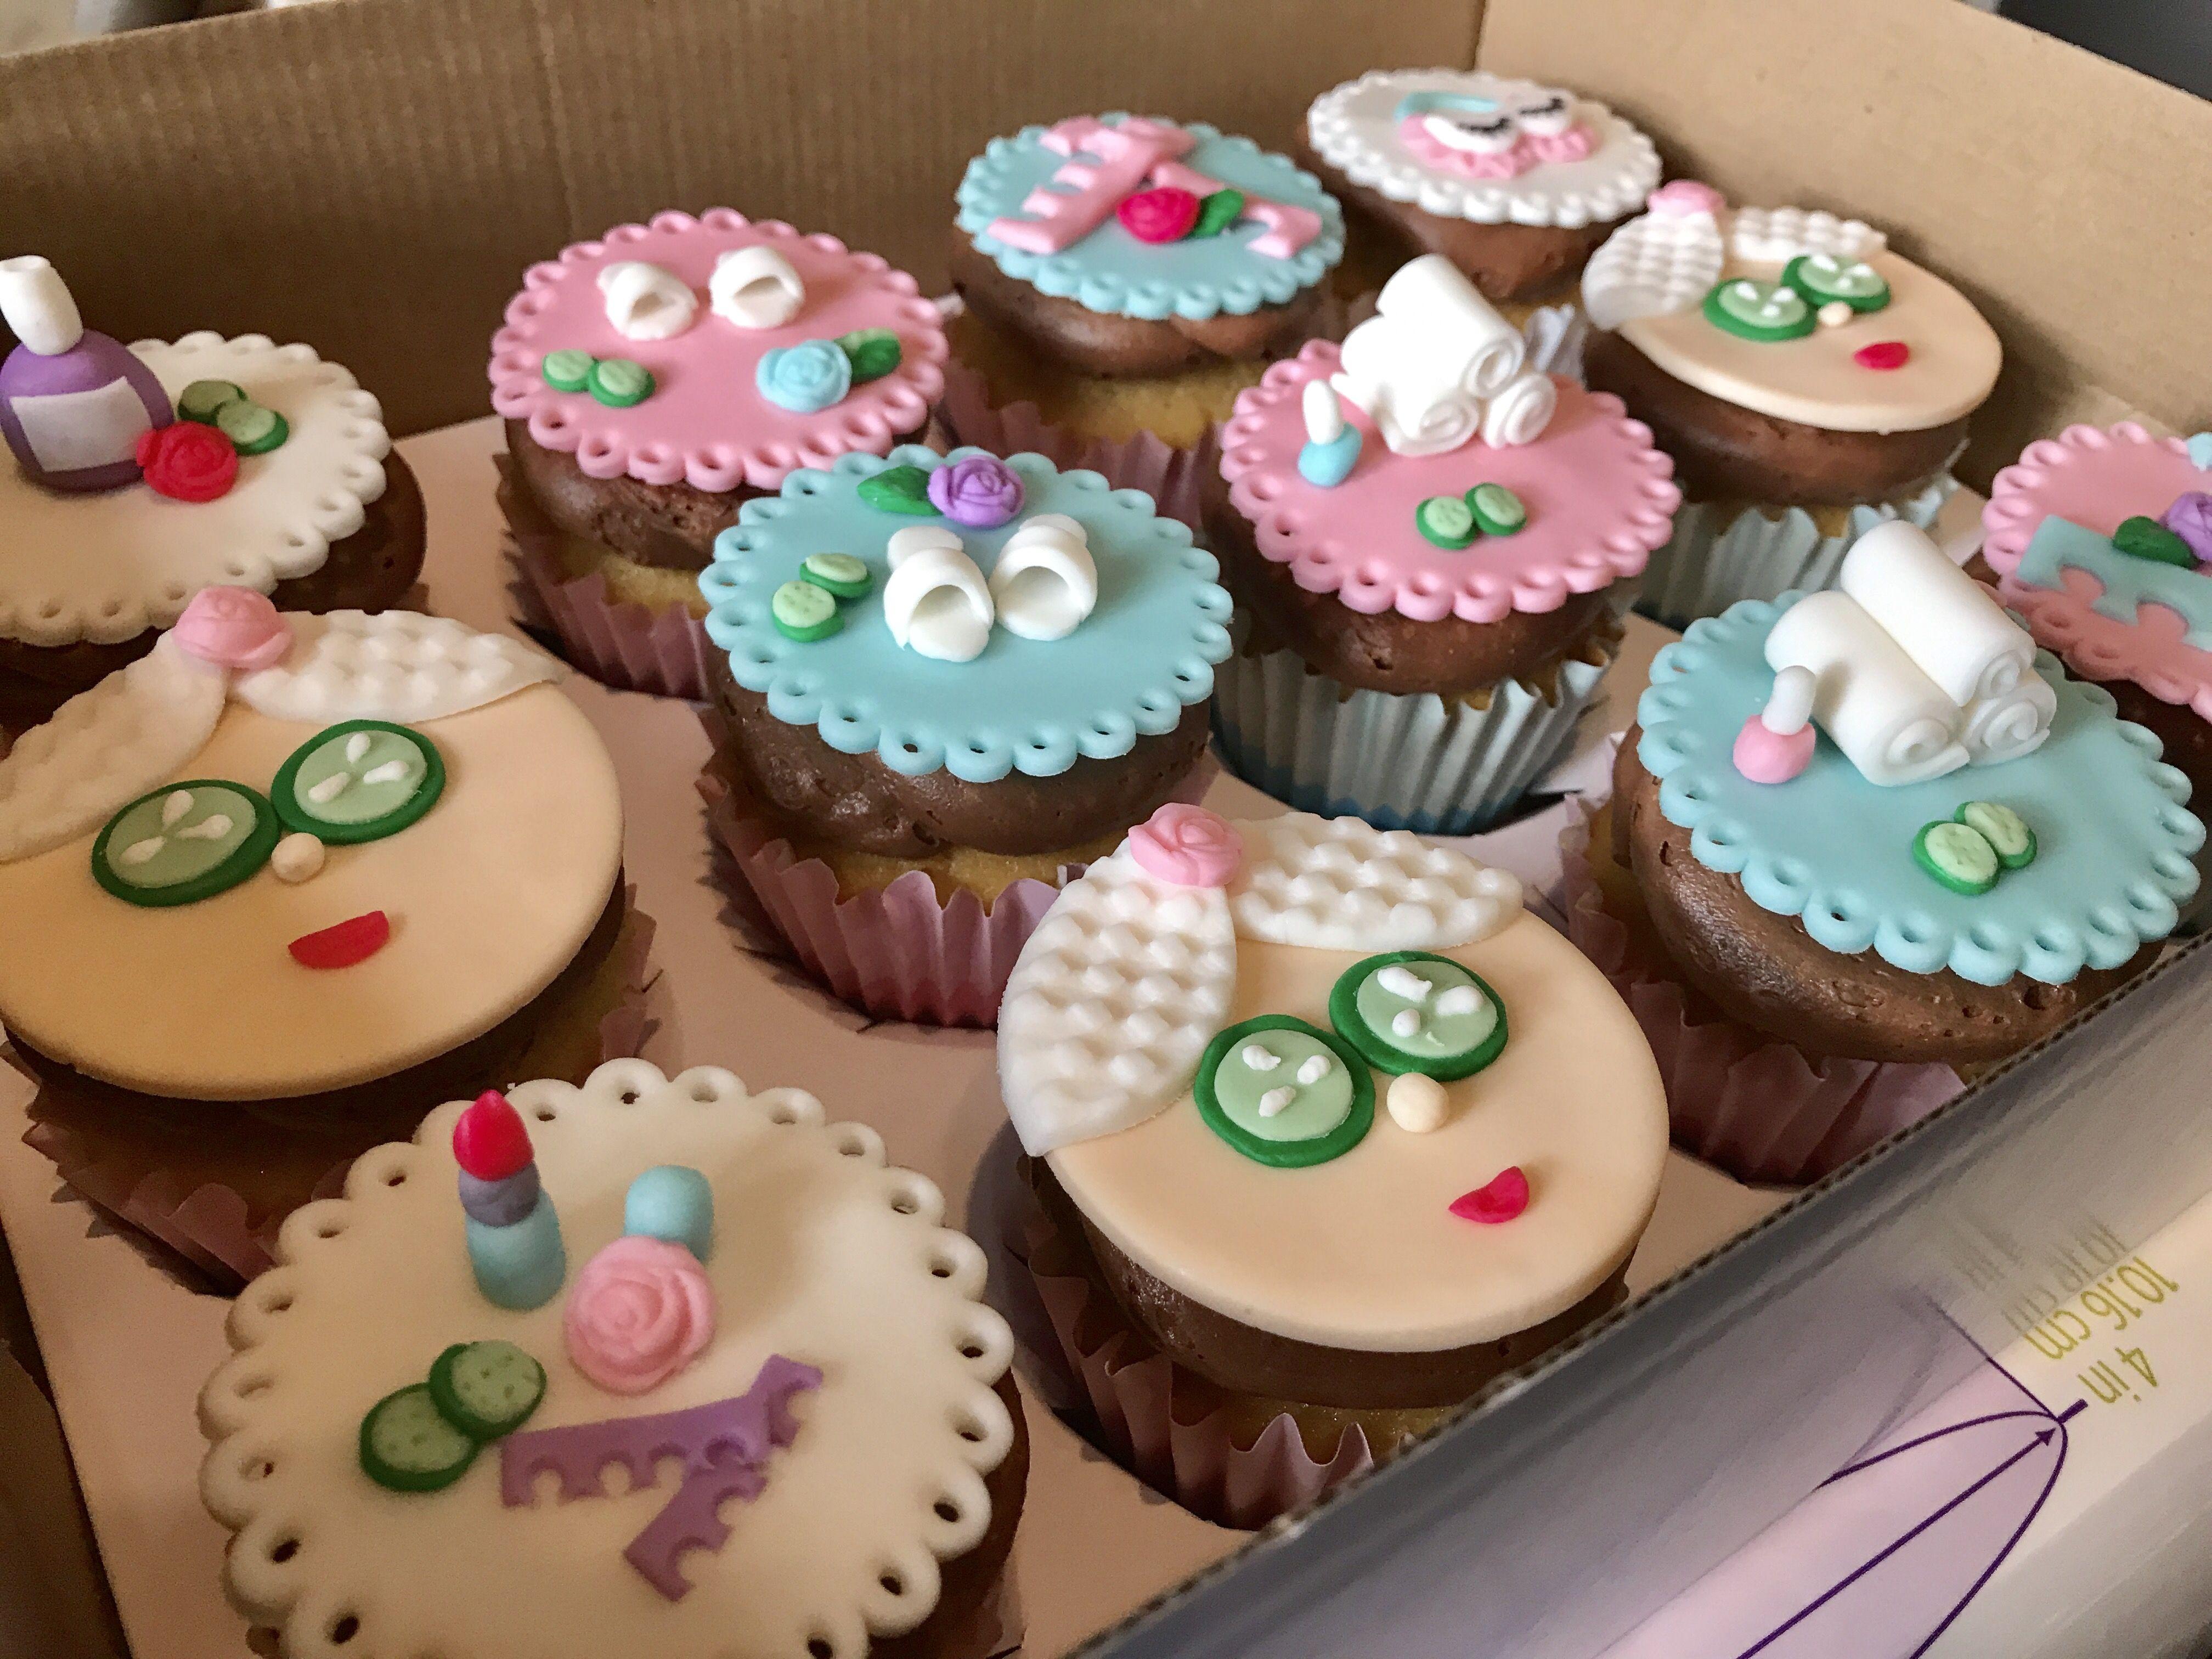 Spa themed cupcakes wwwfacebookcomFriscoCakePopShop wwwinstagram